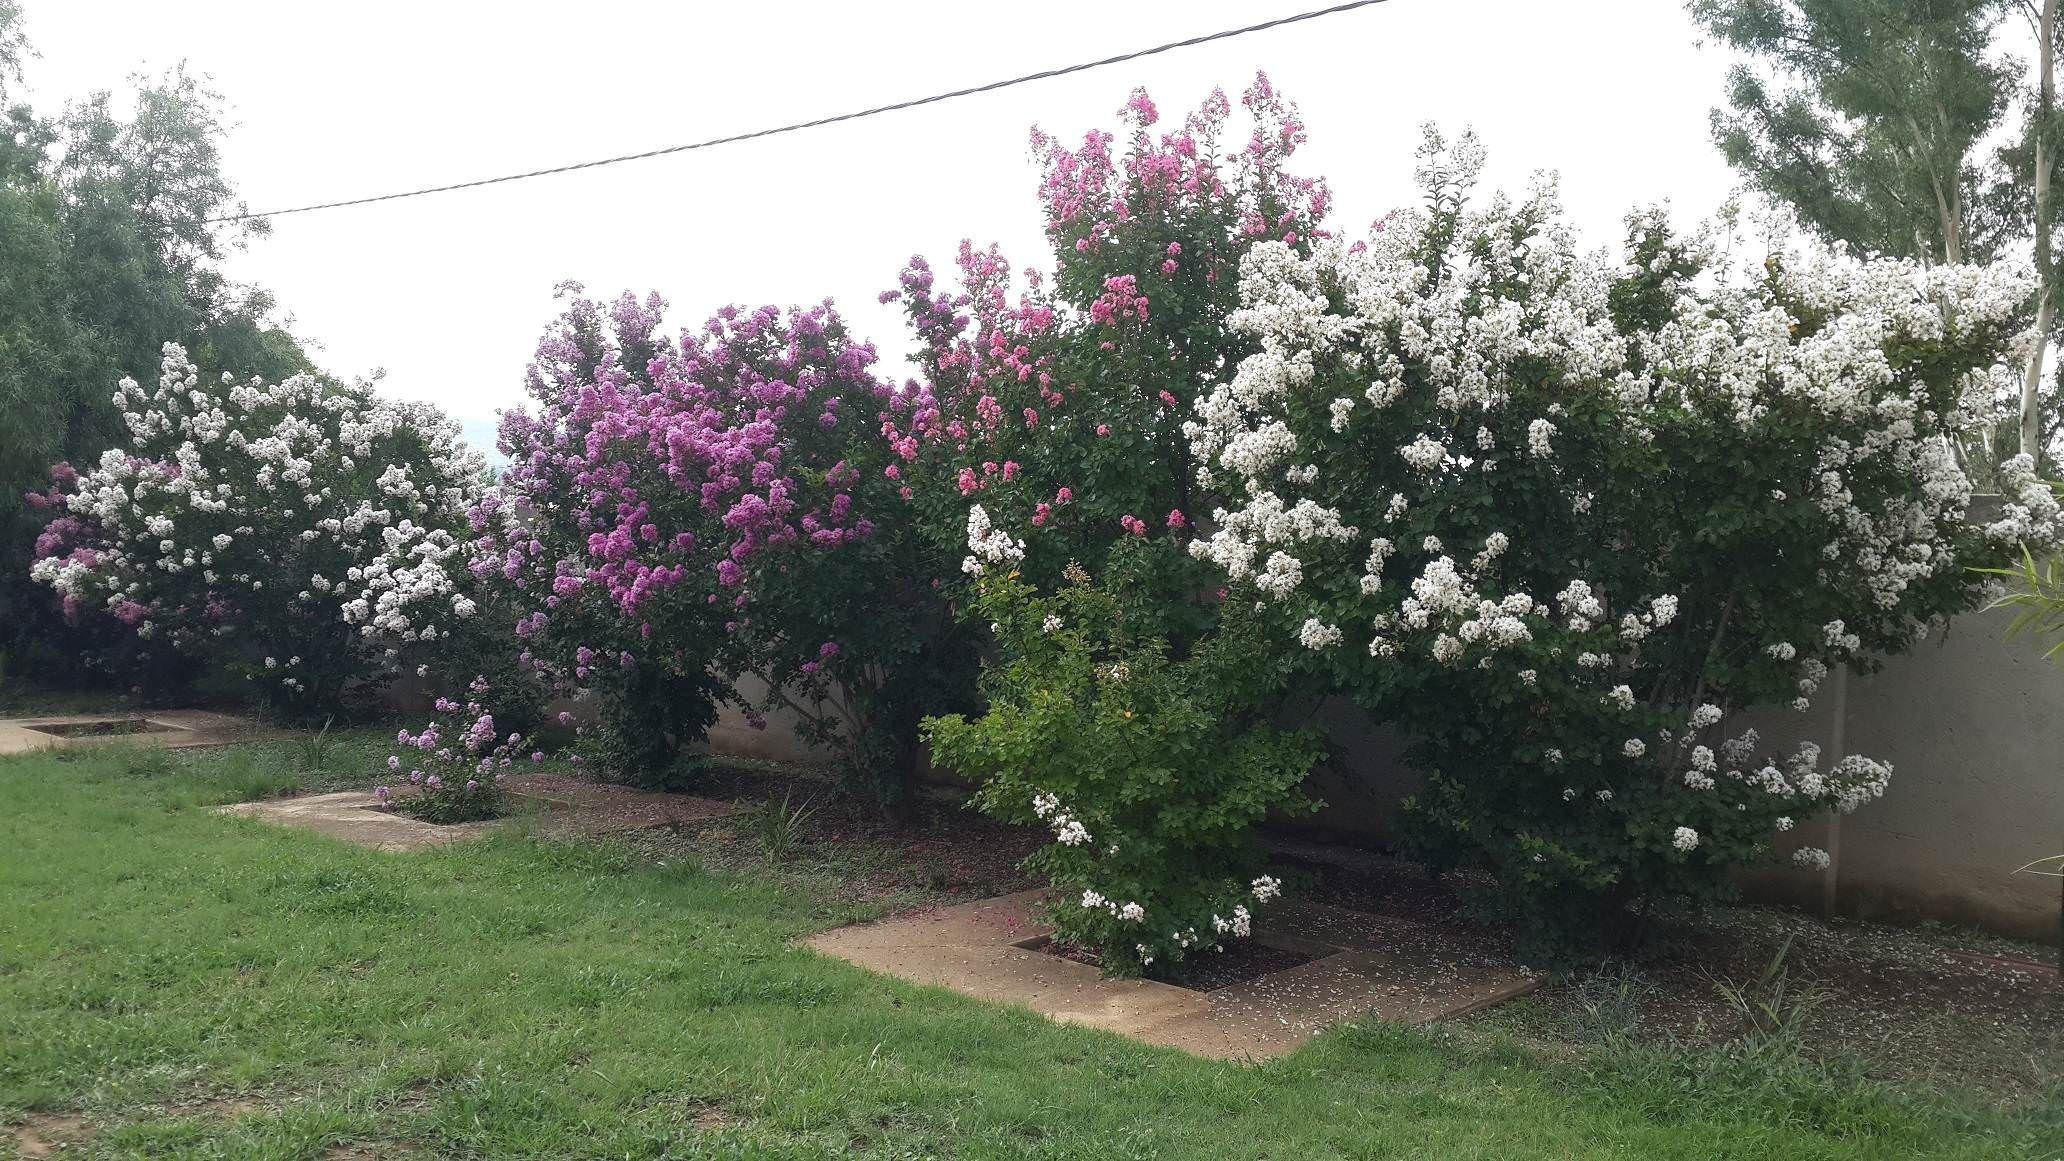 My Pride Of India Trees In Full Bloom Gardening Garden Diy Home